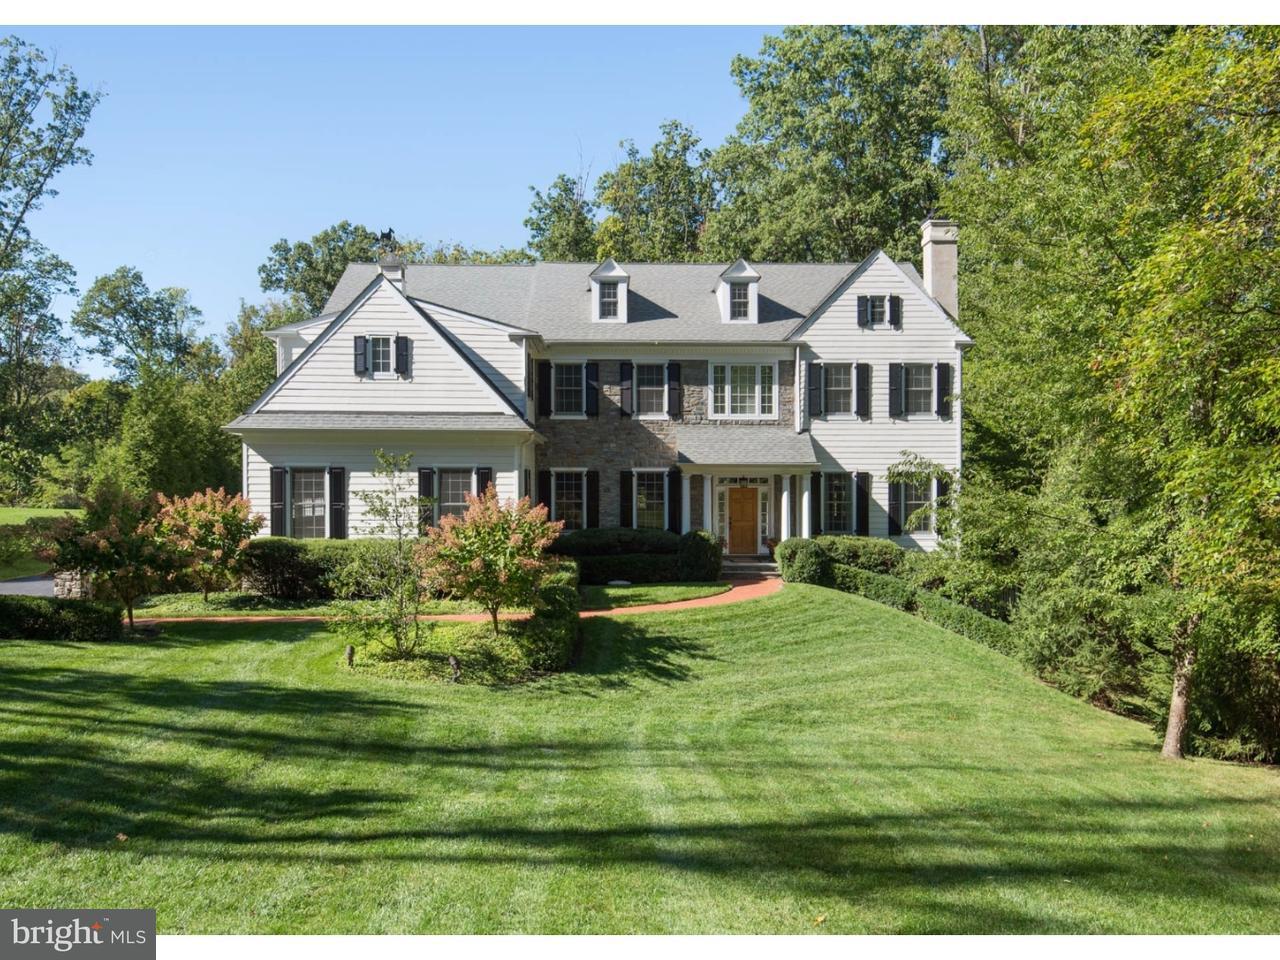 Single Family Home for Sale at 1633 MAPLE Avenue Paoli, Pennsylvania 19301 United States